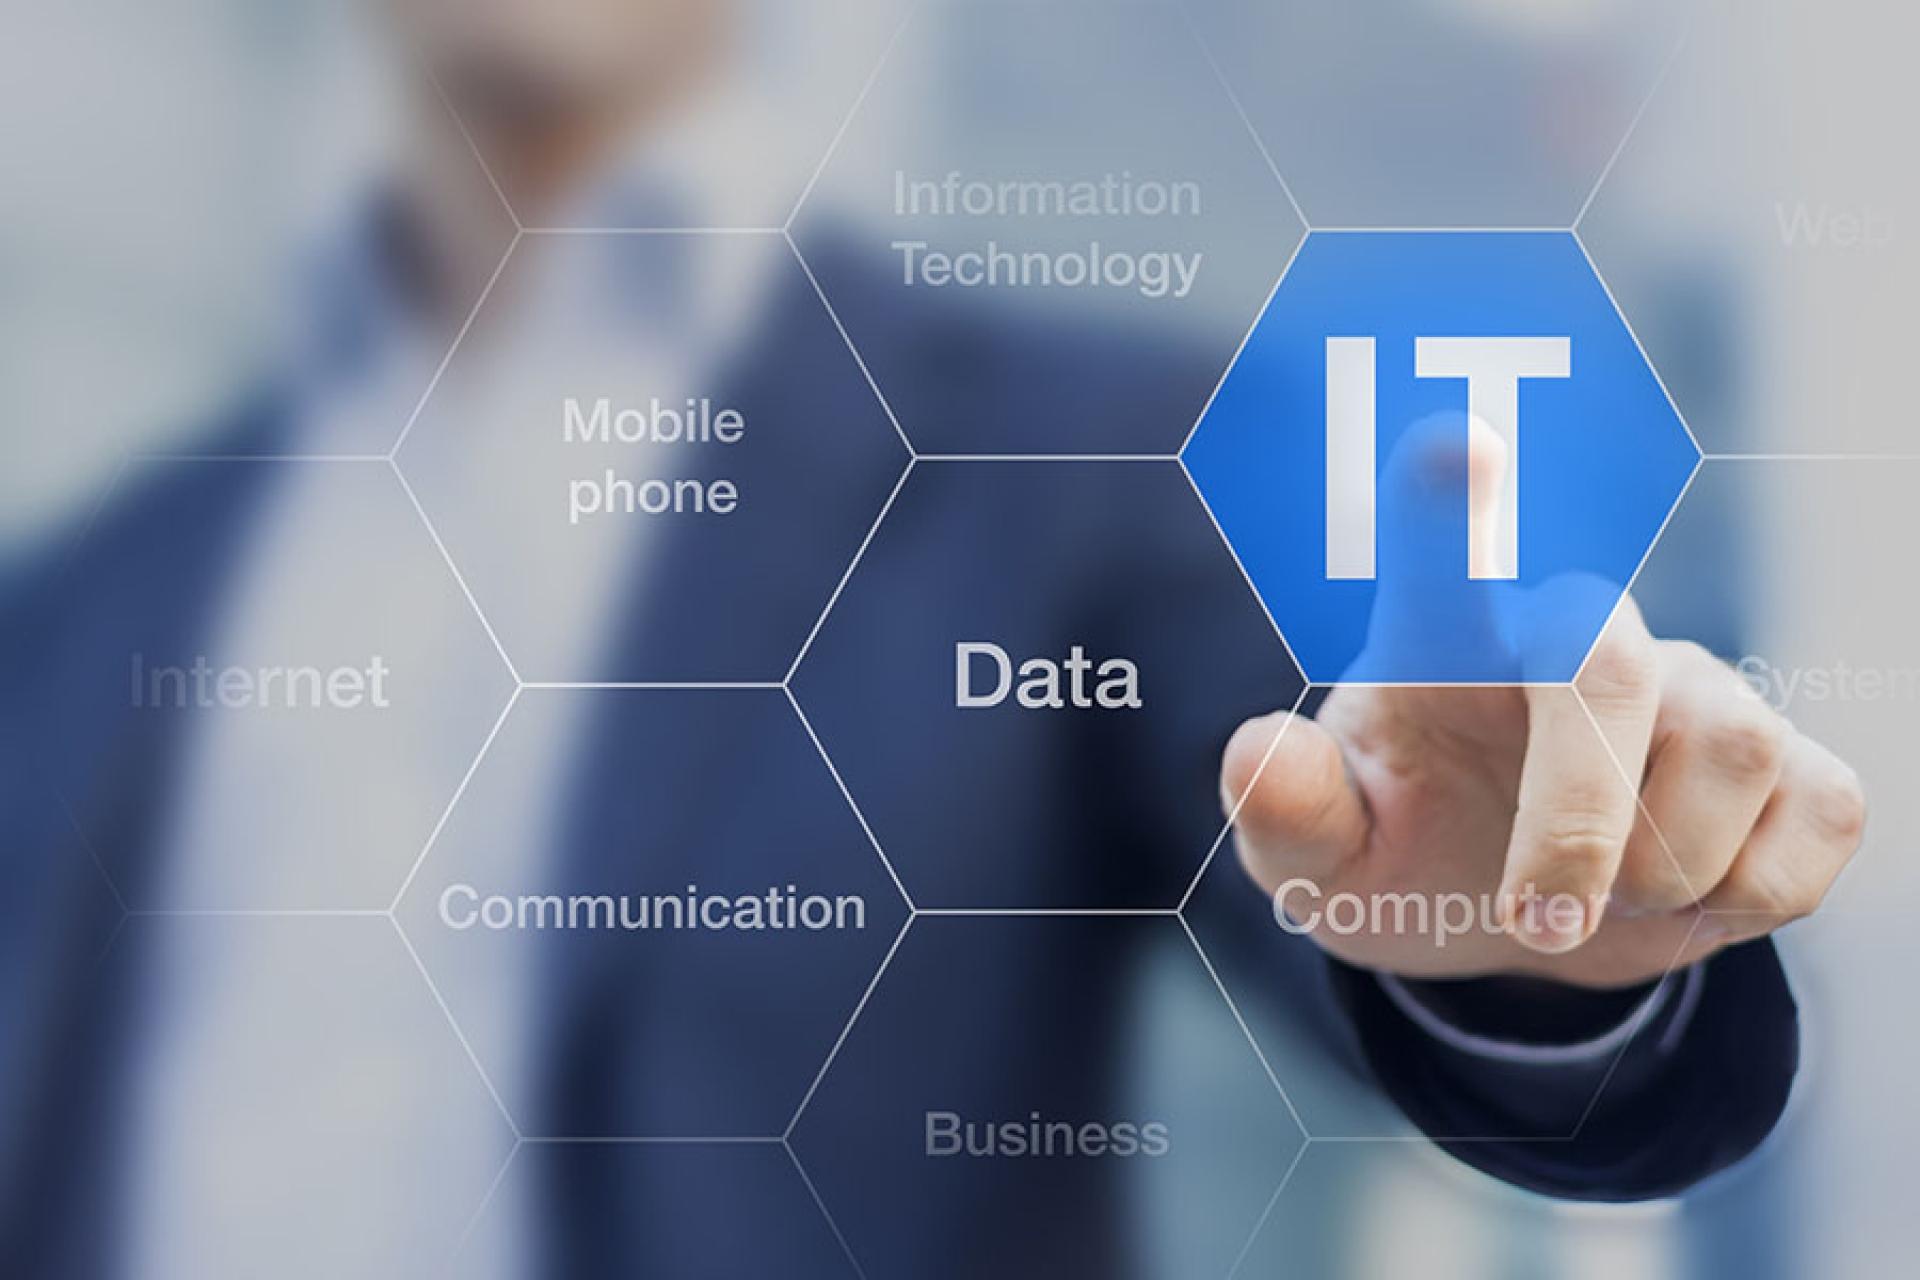 InformationTechnology - &Software Develoment